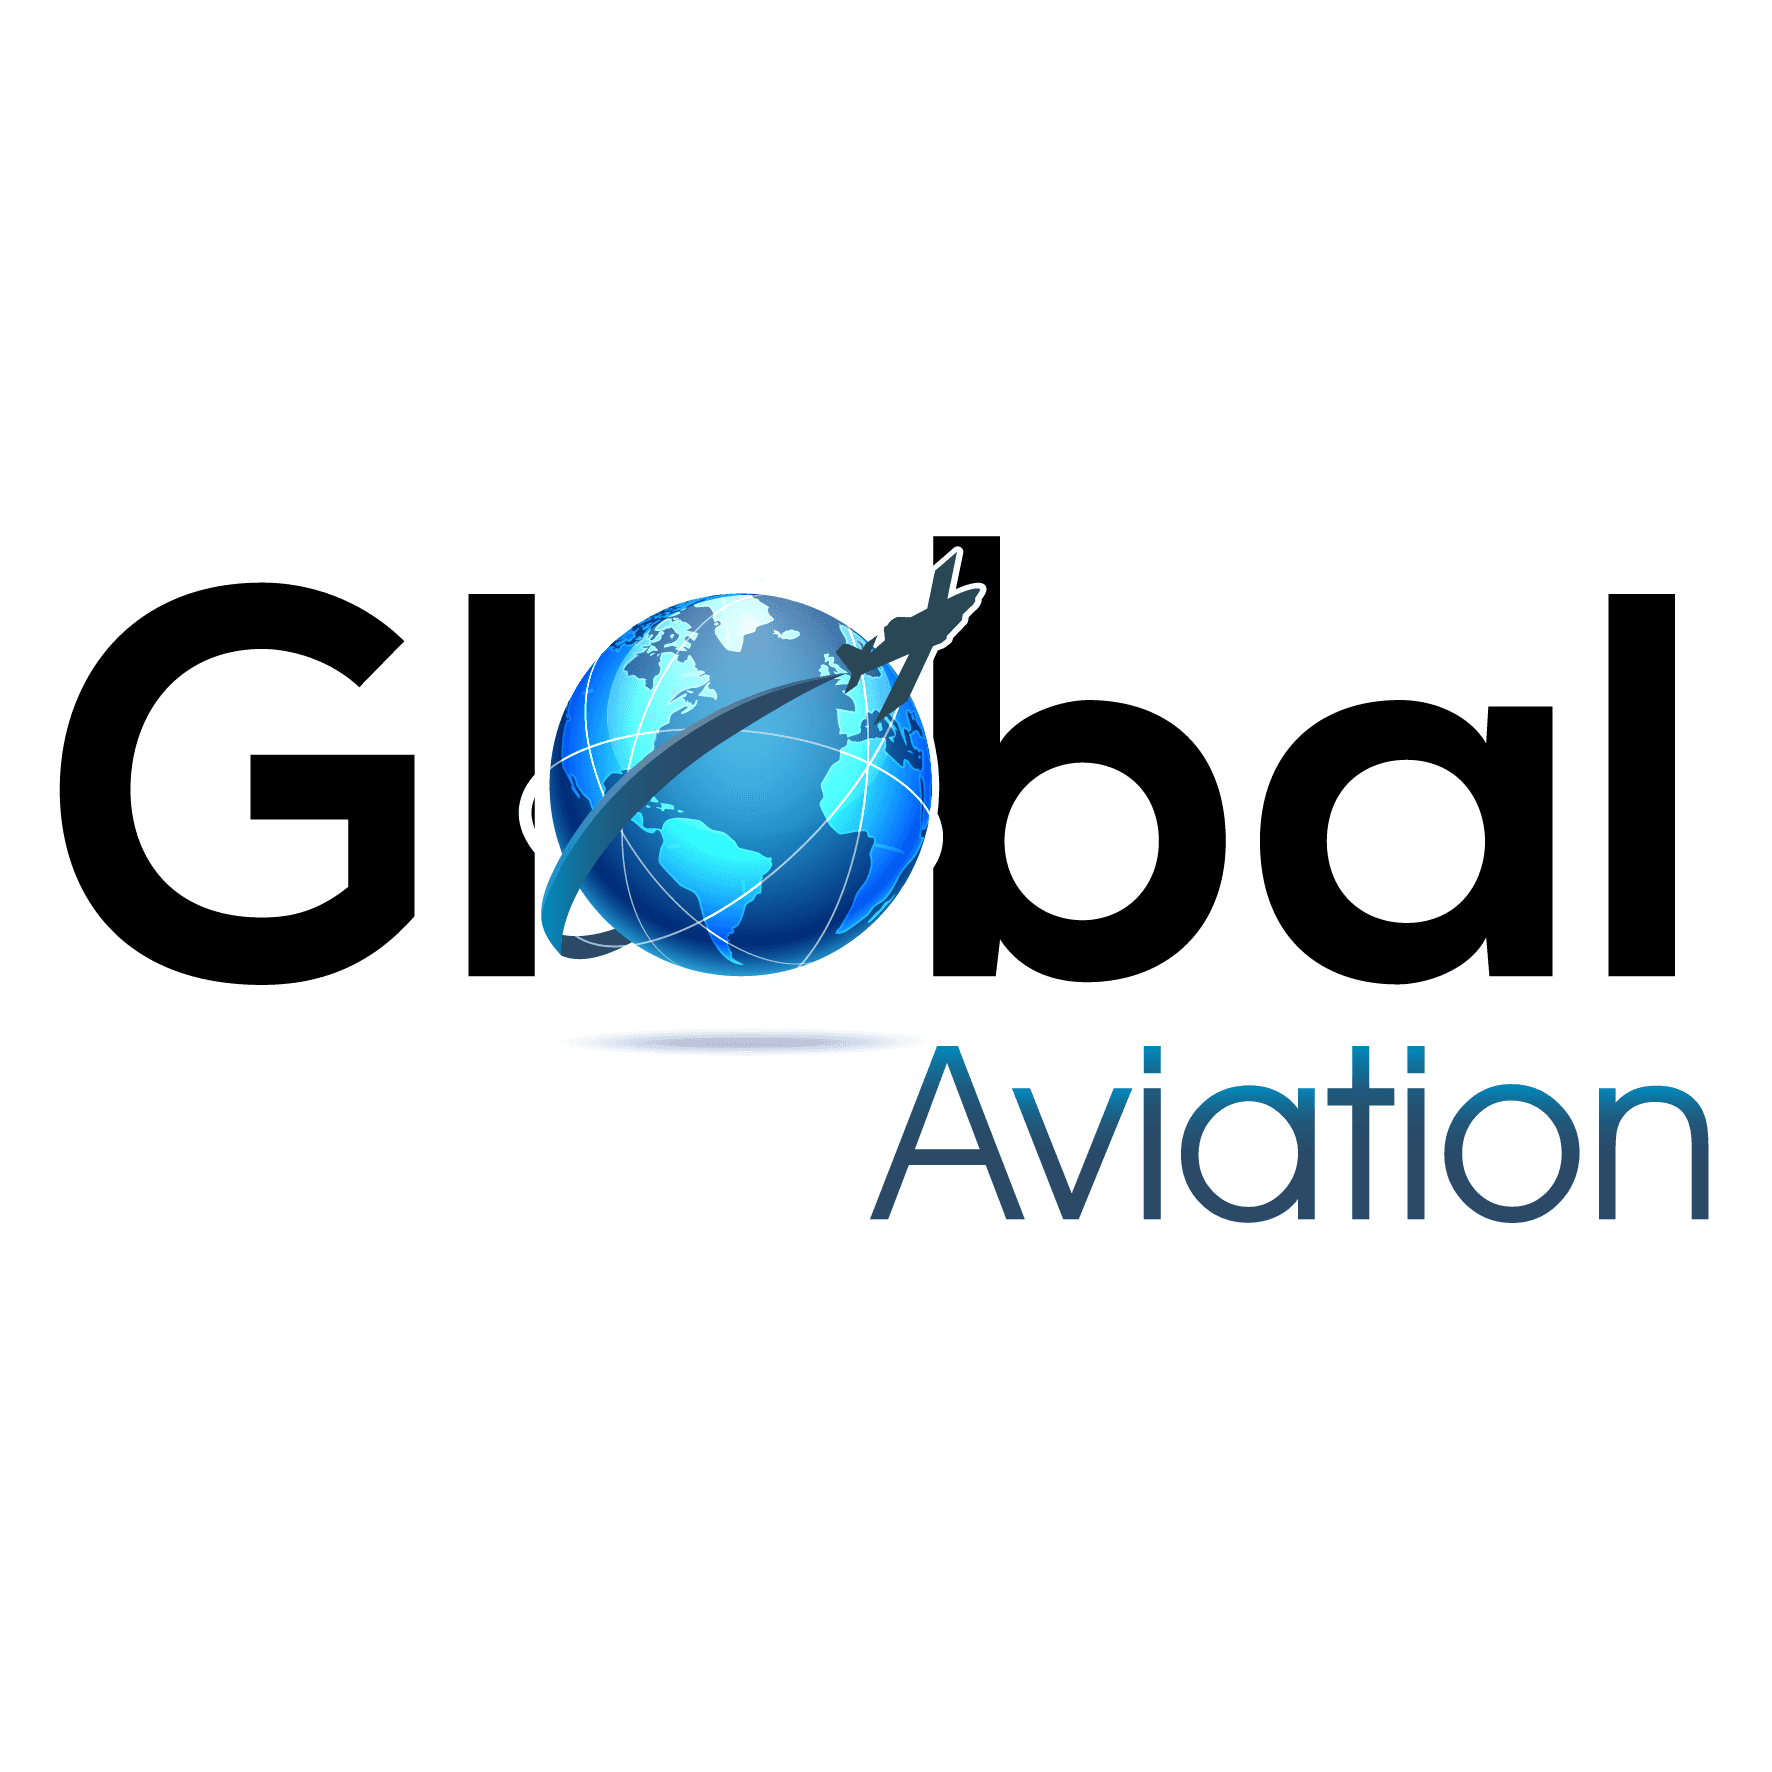 GLOBAL AVIATION LLC